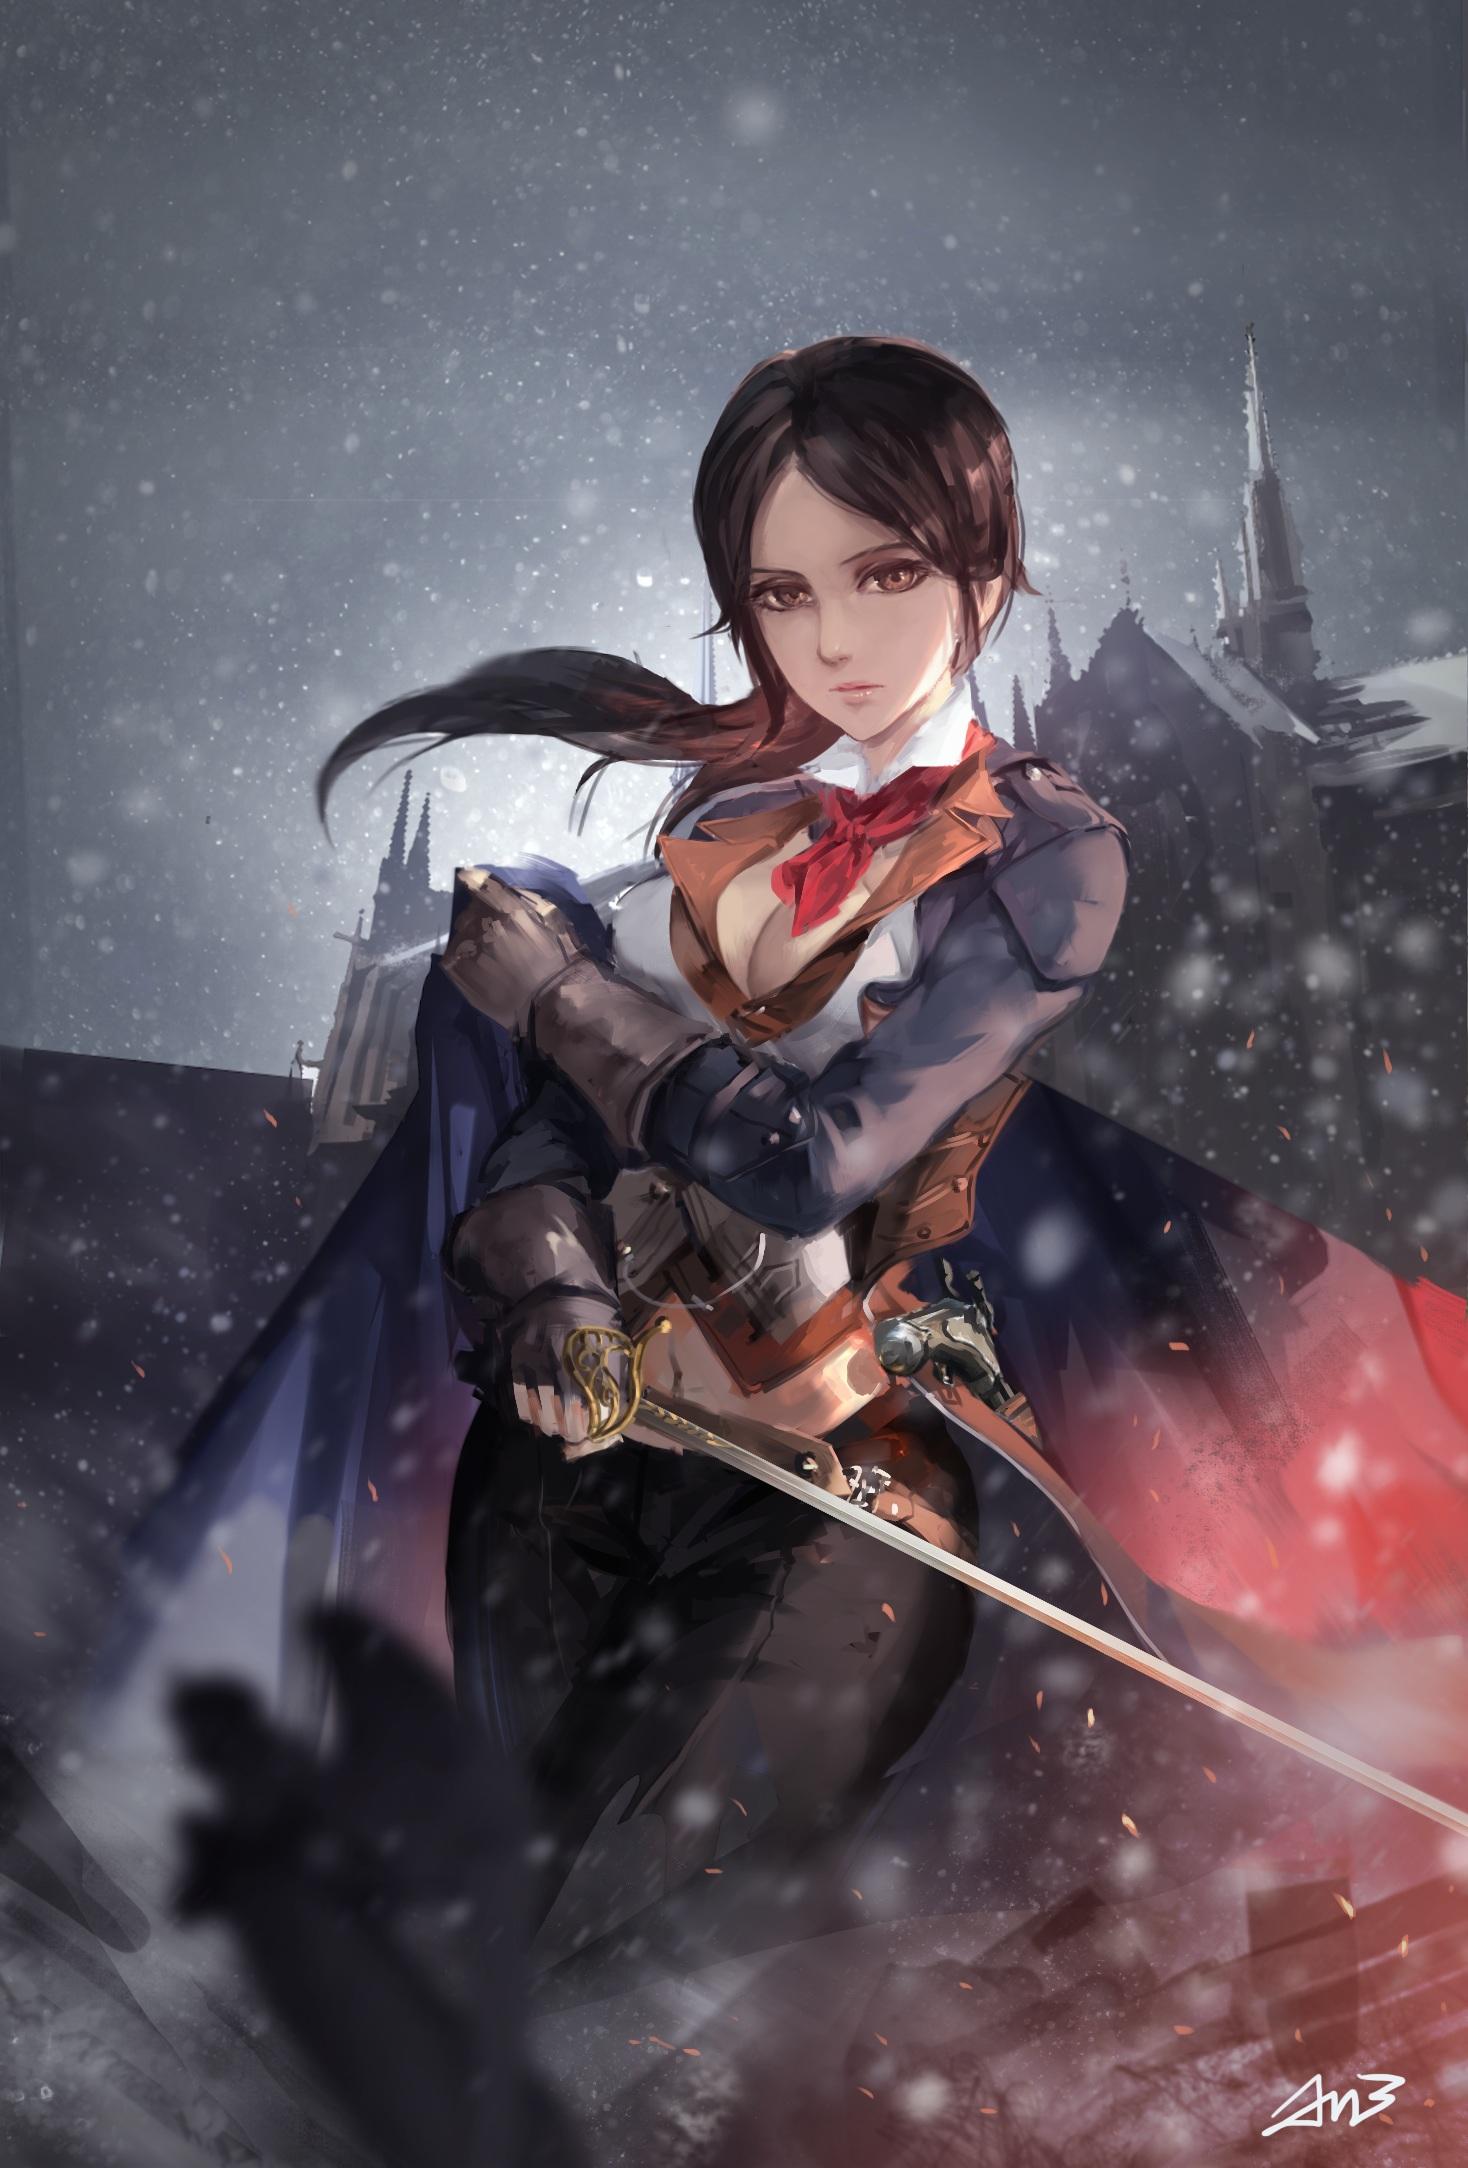 Wallpaper Digital Art Artwork Video Games Women Assassin S